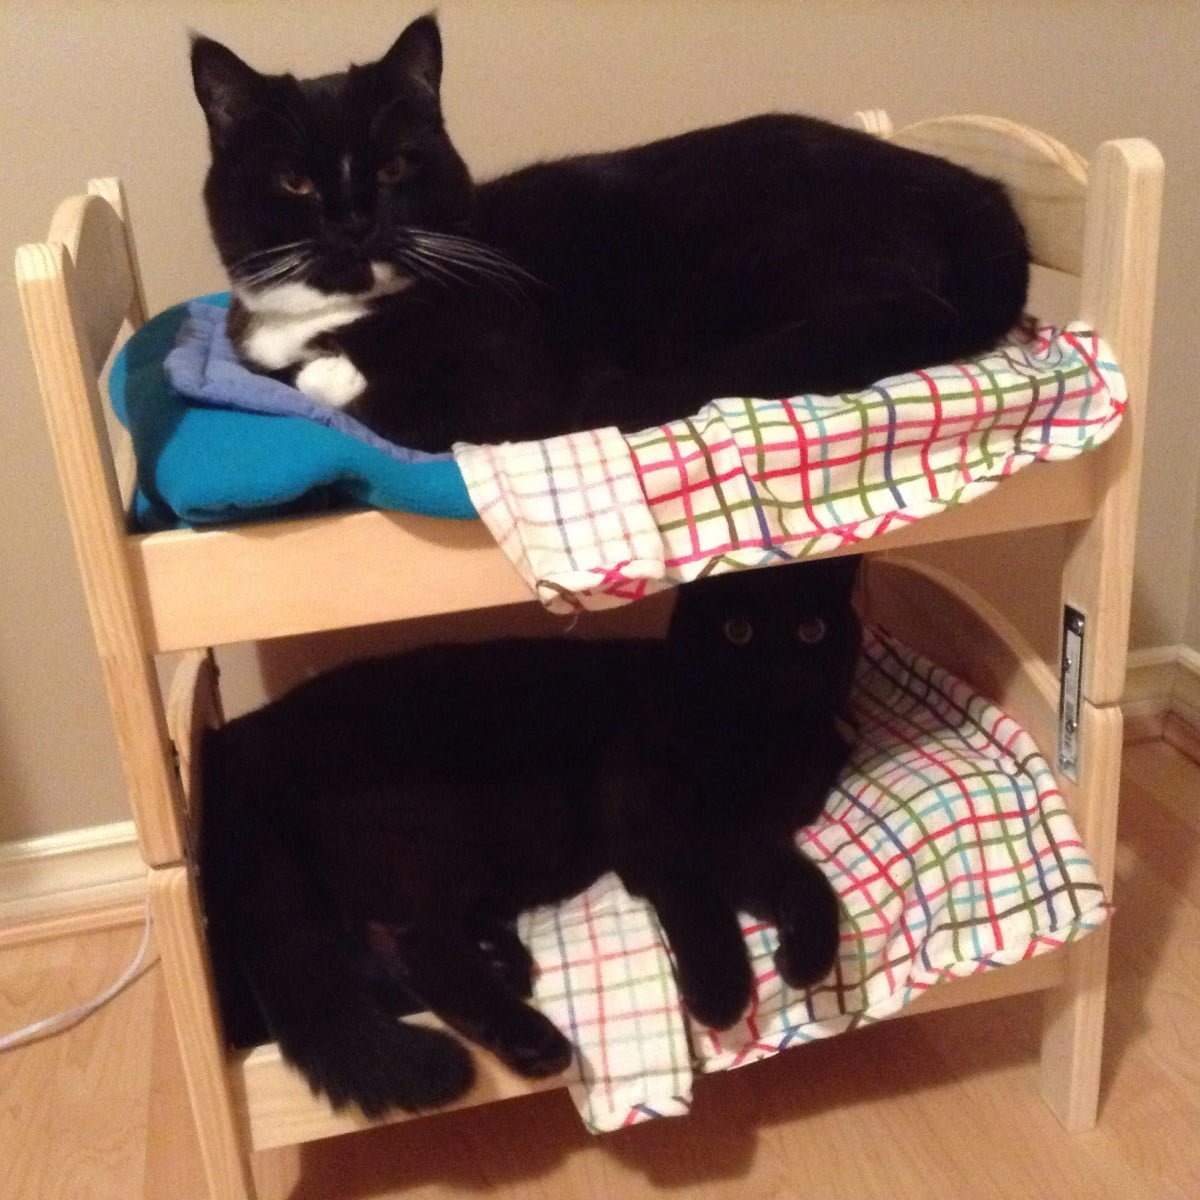 diy cat bunk bed using ikea DUKTIG doll bed